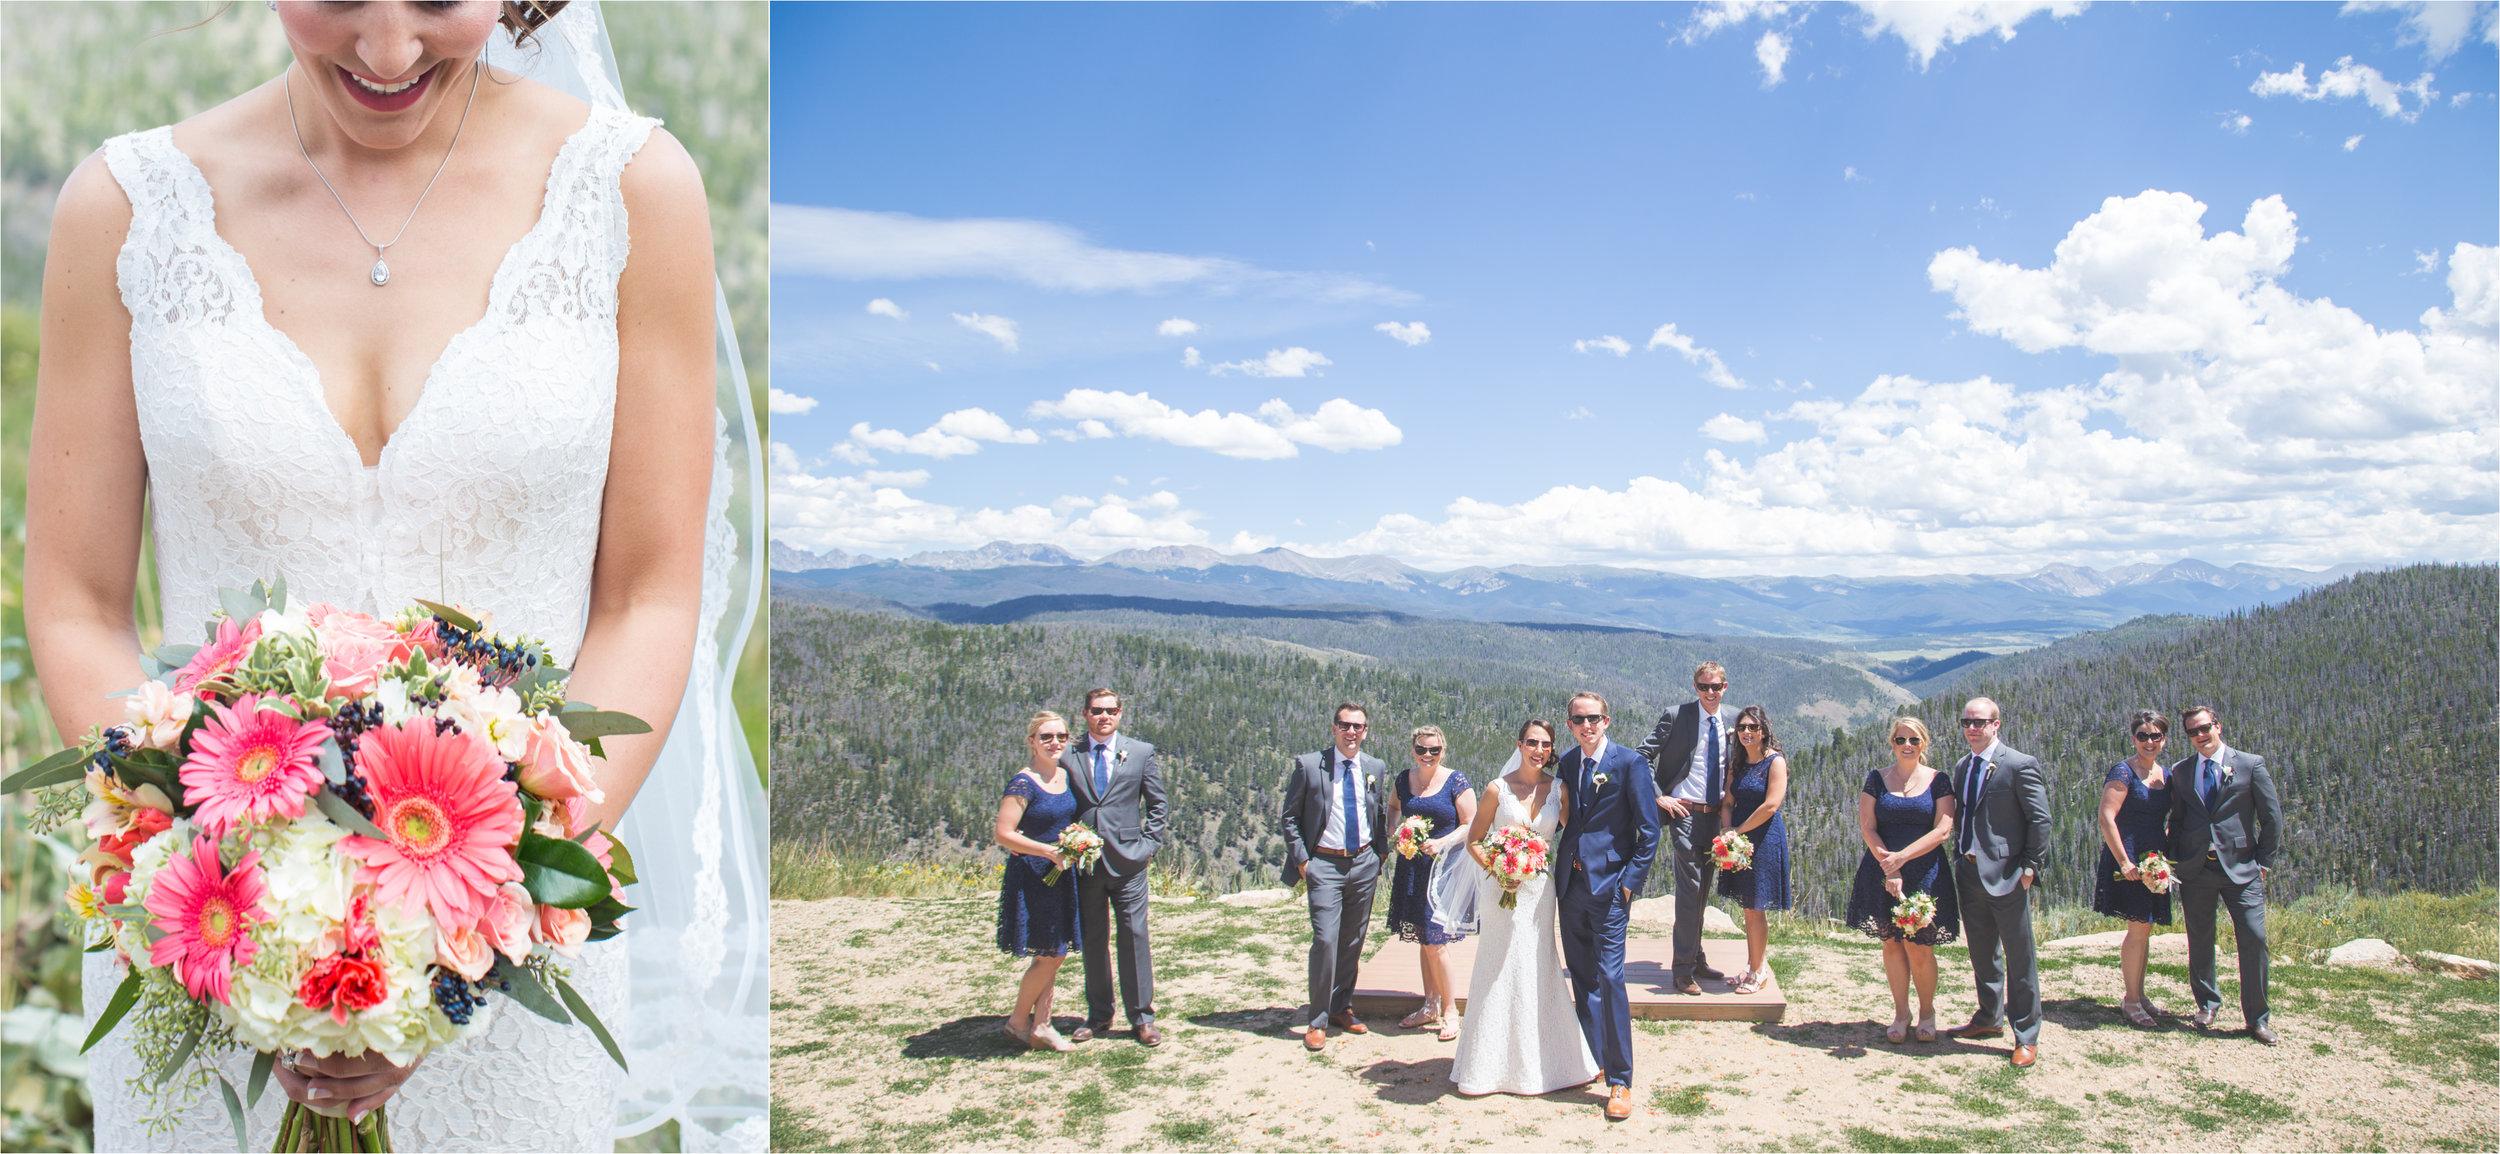 Duncan Wedding 6.jpg